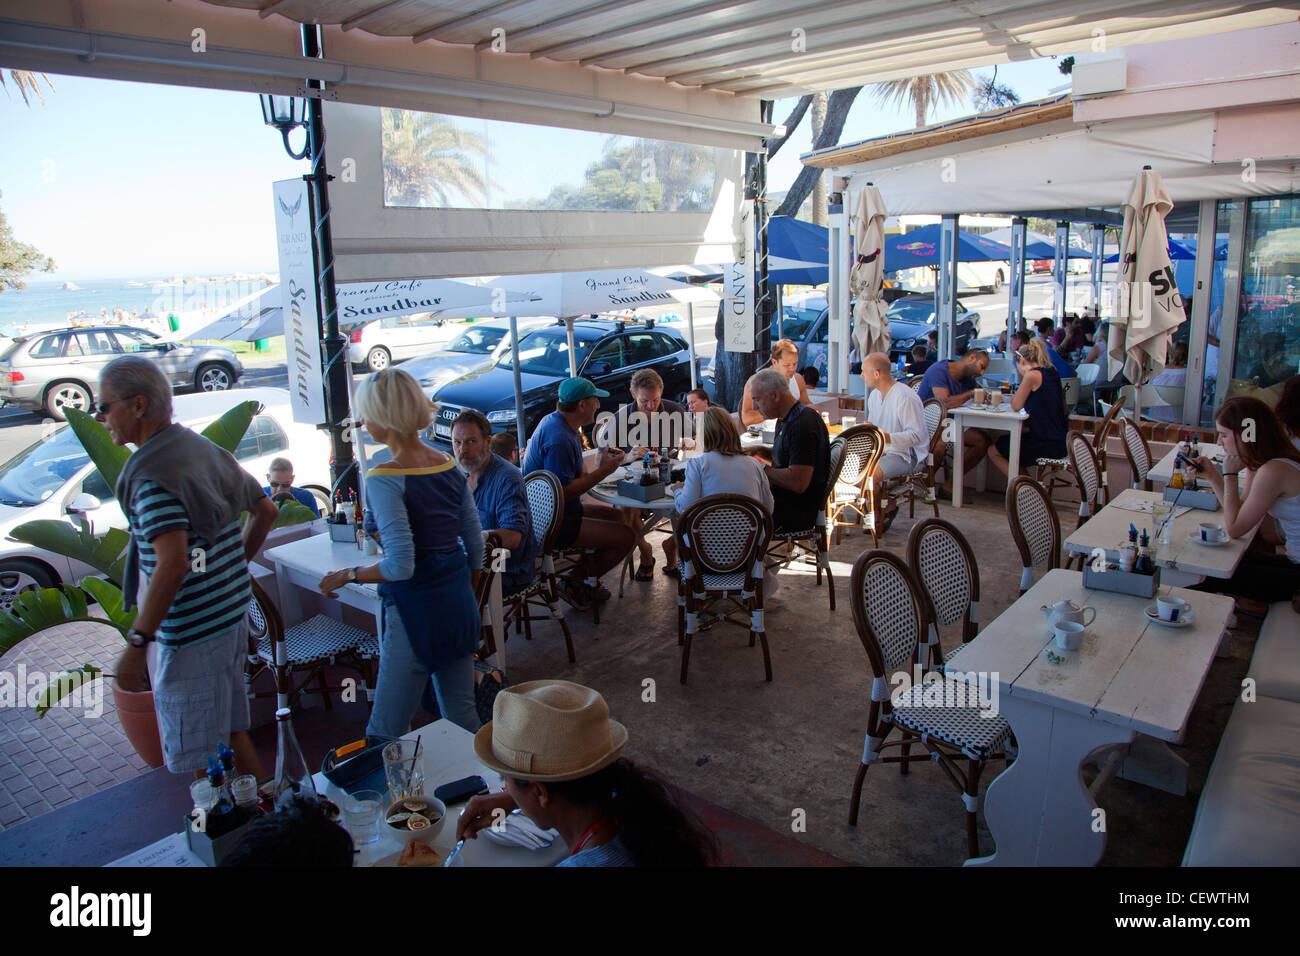 Sandbar at the Grand - Cafe in Camps Bay - Stock Image